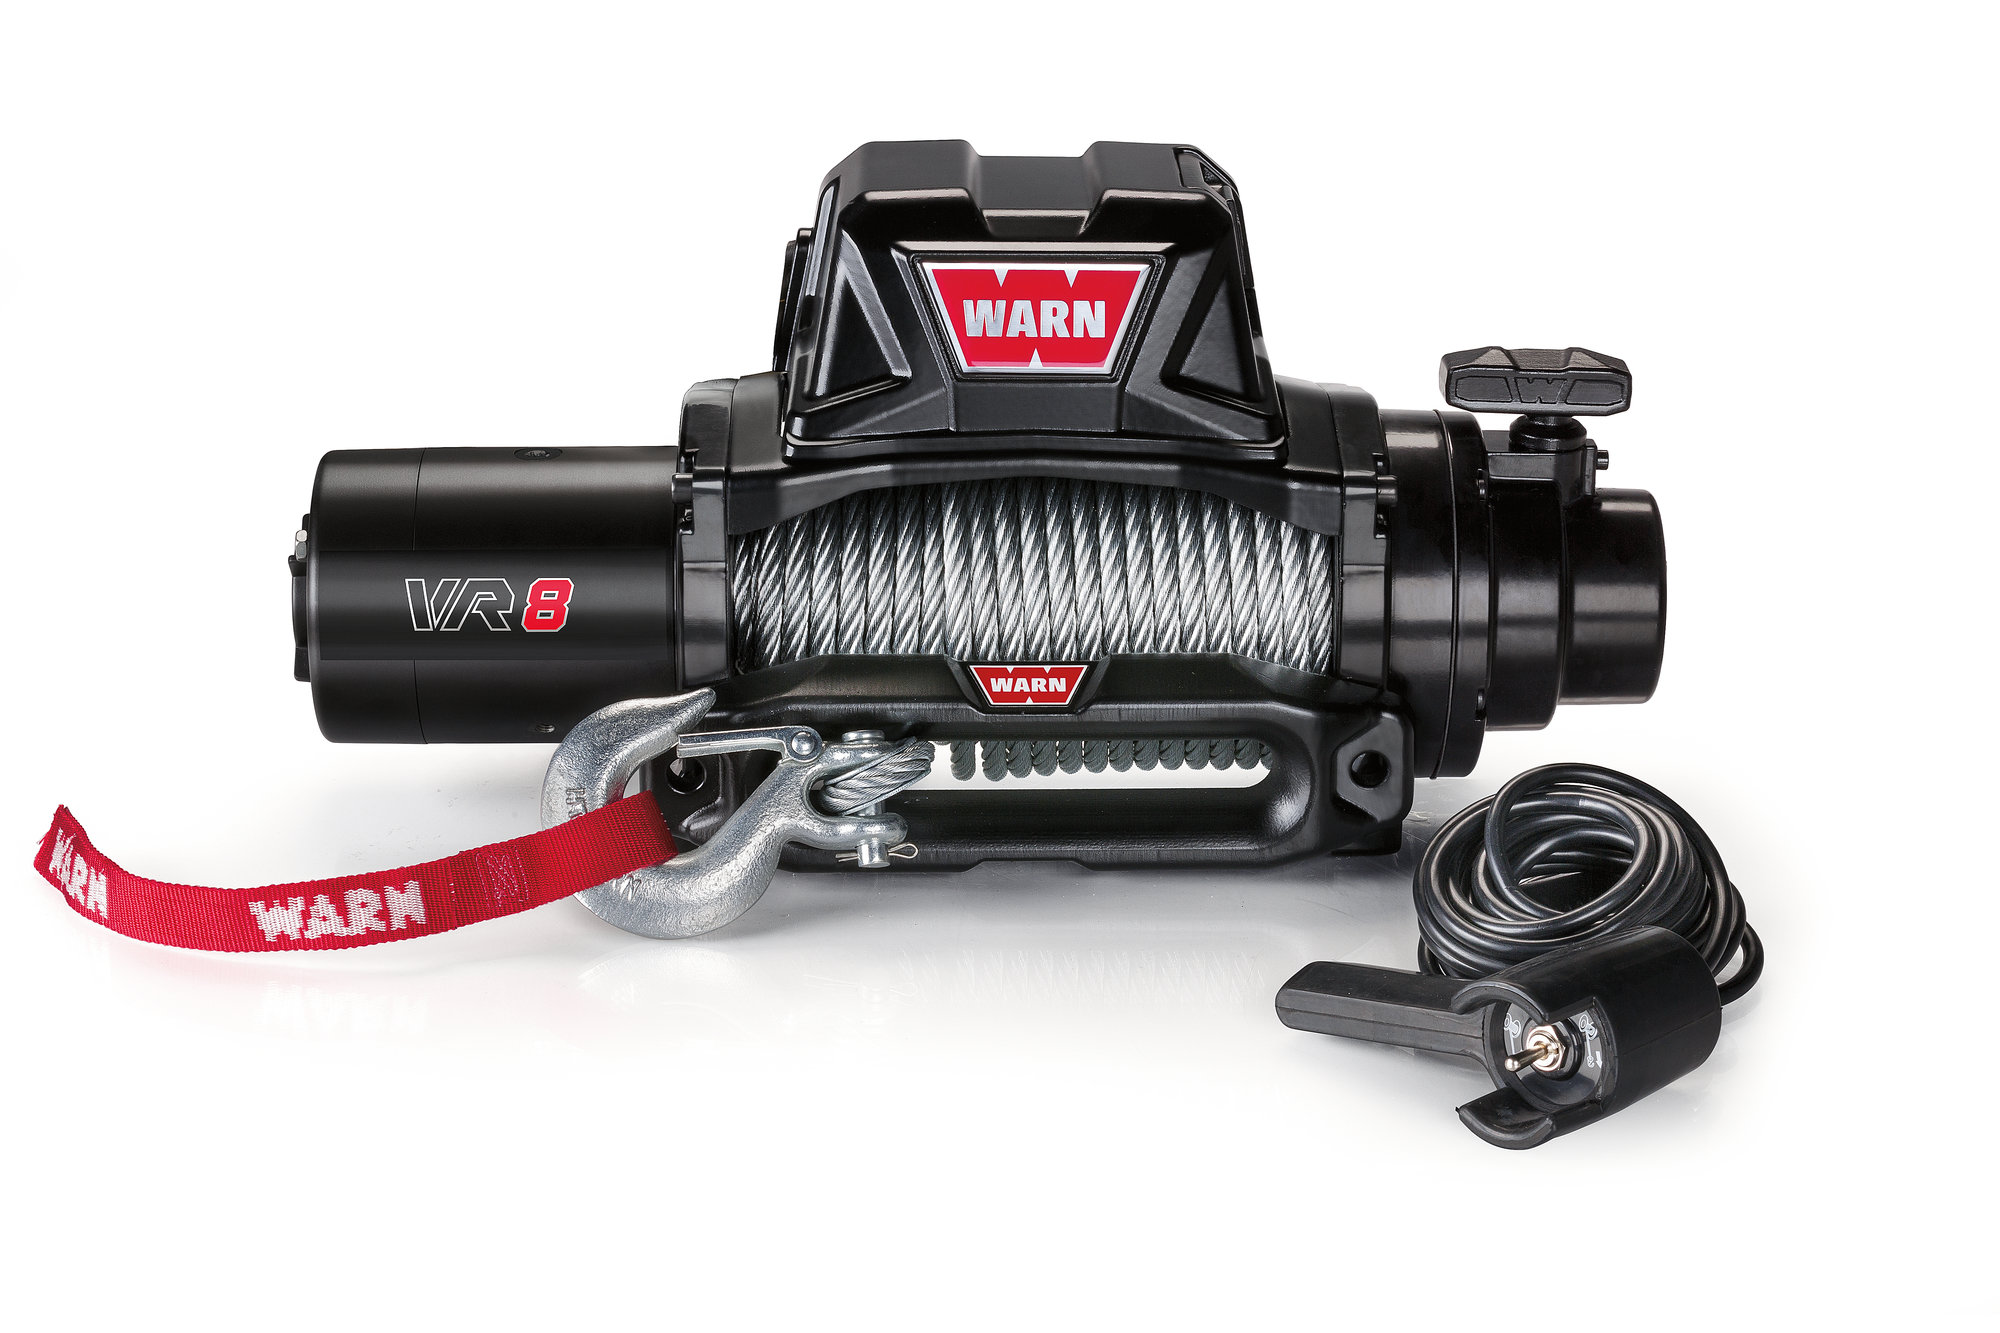 WARN 96800 VR8 Series 8000lb Winch?resize=665%2C443&ssl=1 wiring diagram for winch ramsey re 12000 old ramsey winch wiring ramsey 12000 lb winch wiring diagram at suagrazia.org